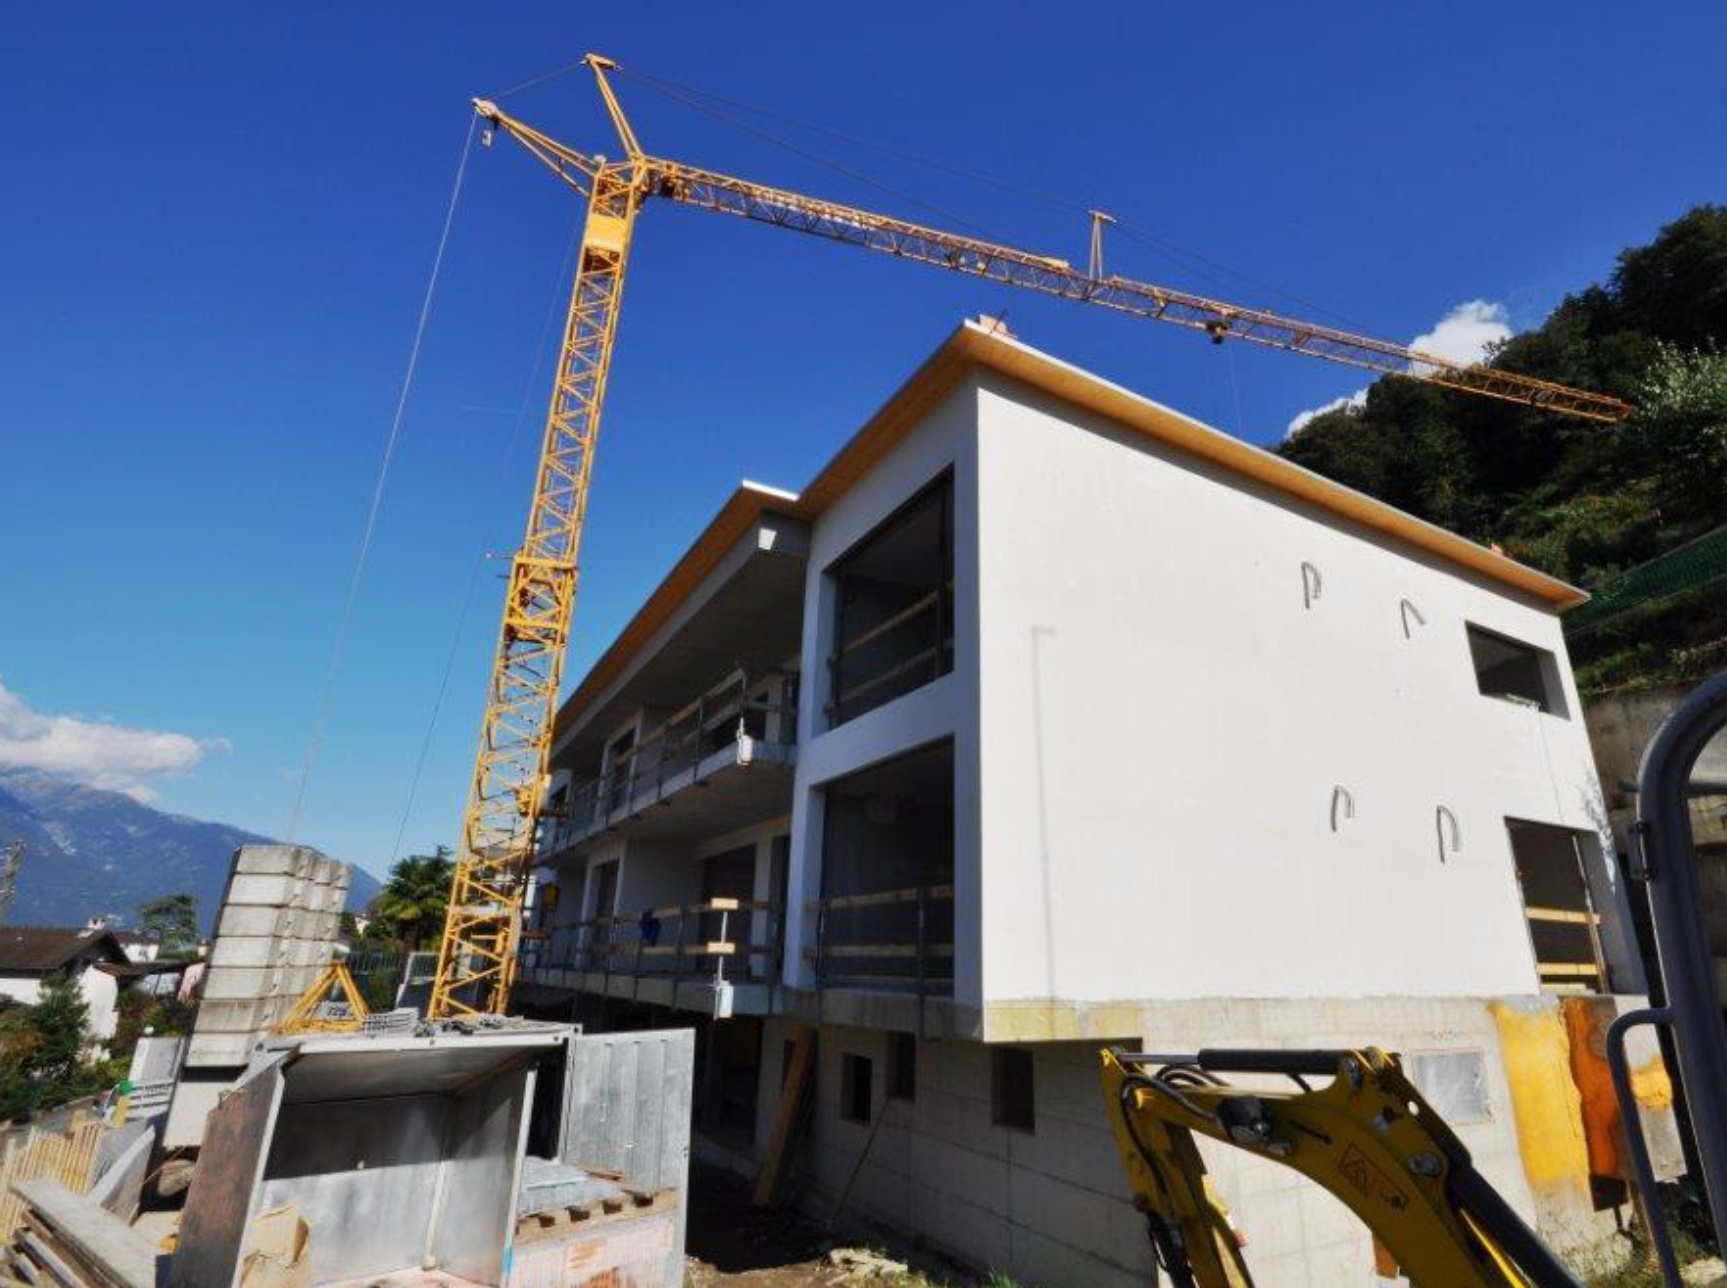 Piazzogna TissoT Immobilier : Appartements